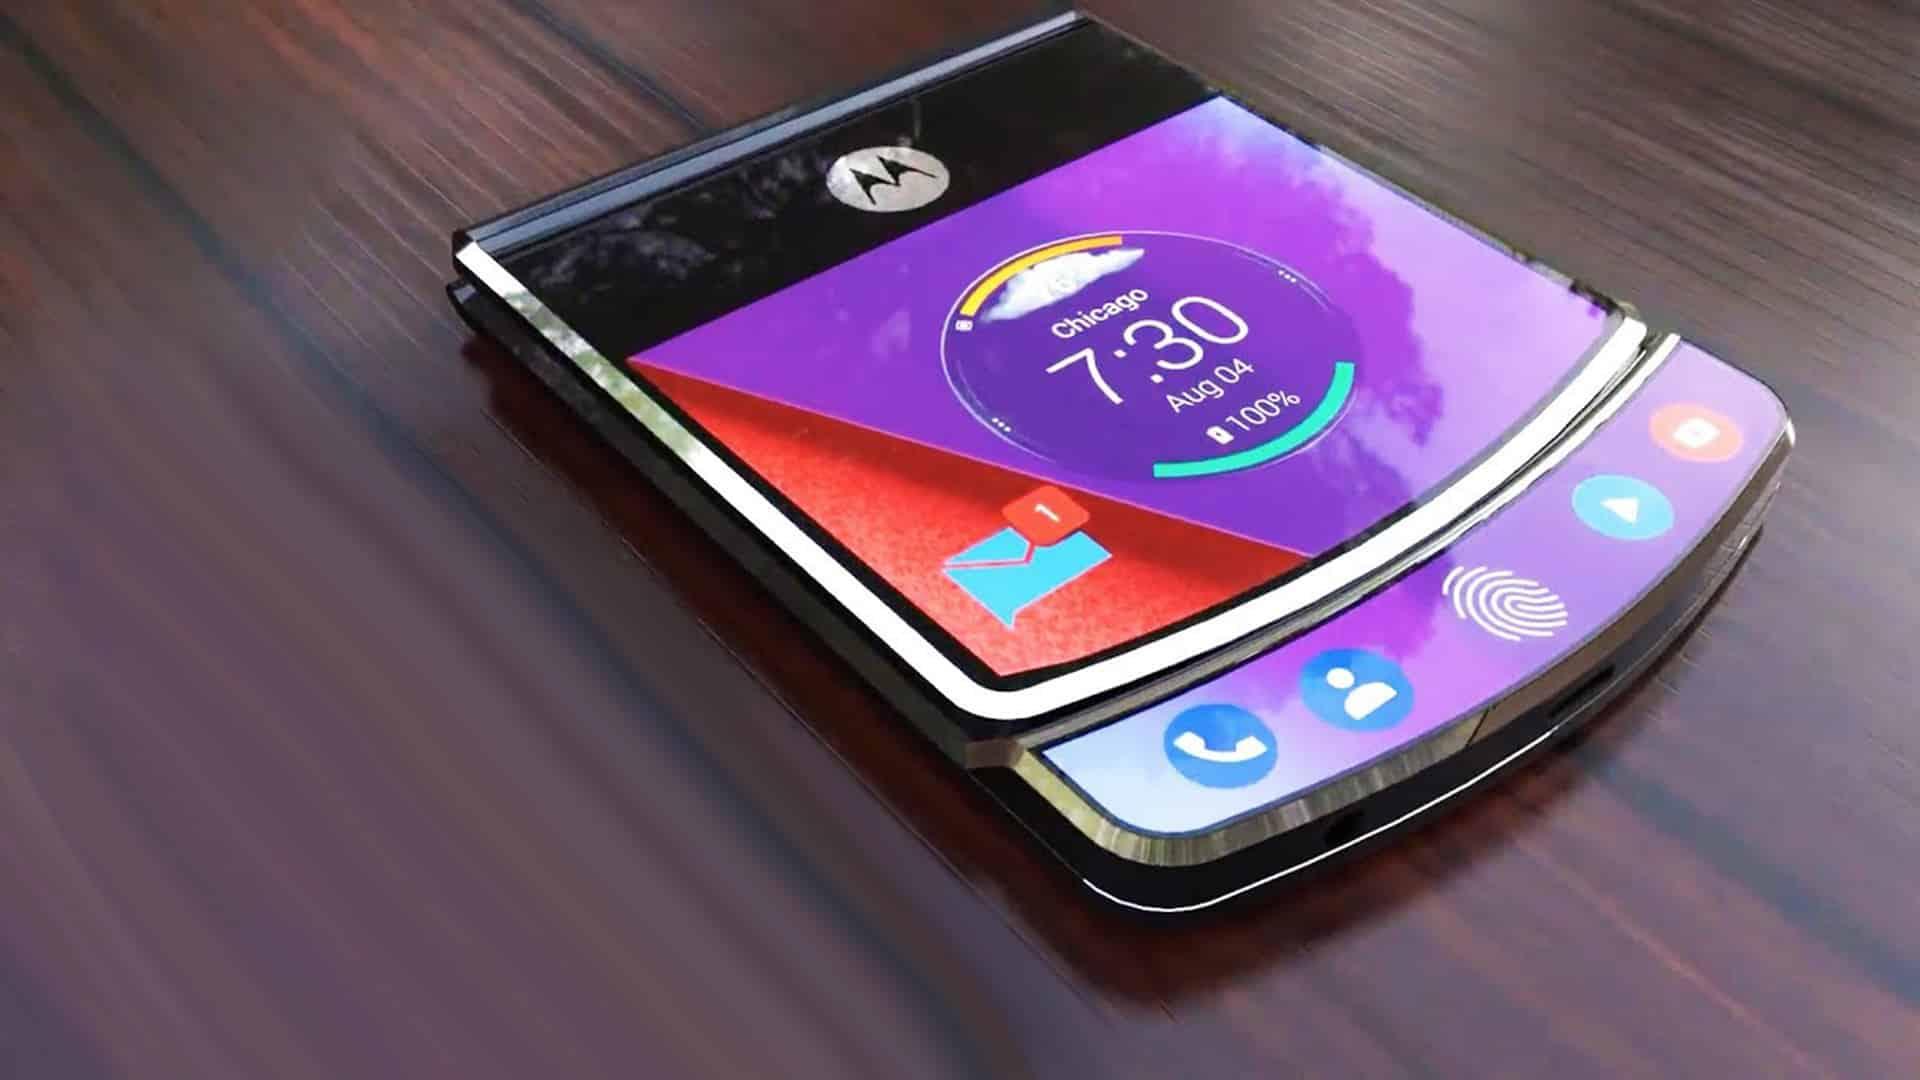 Le smartphone pliable de Motorola